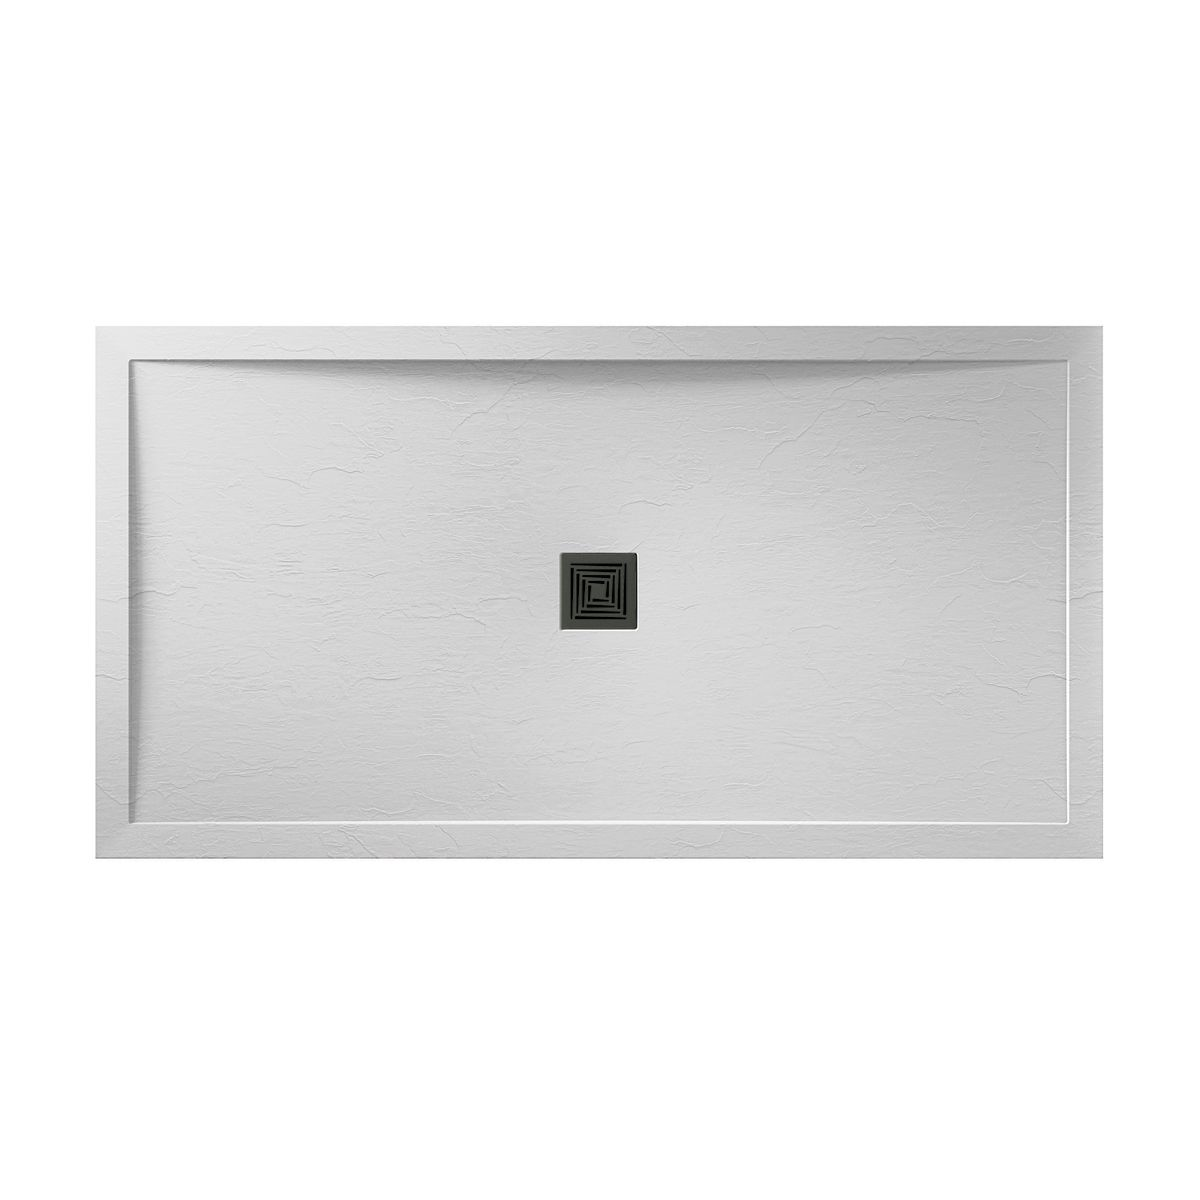 Aquadart White Slate Shower Tray 1600 x 760